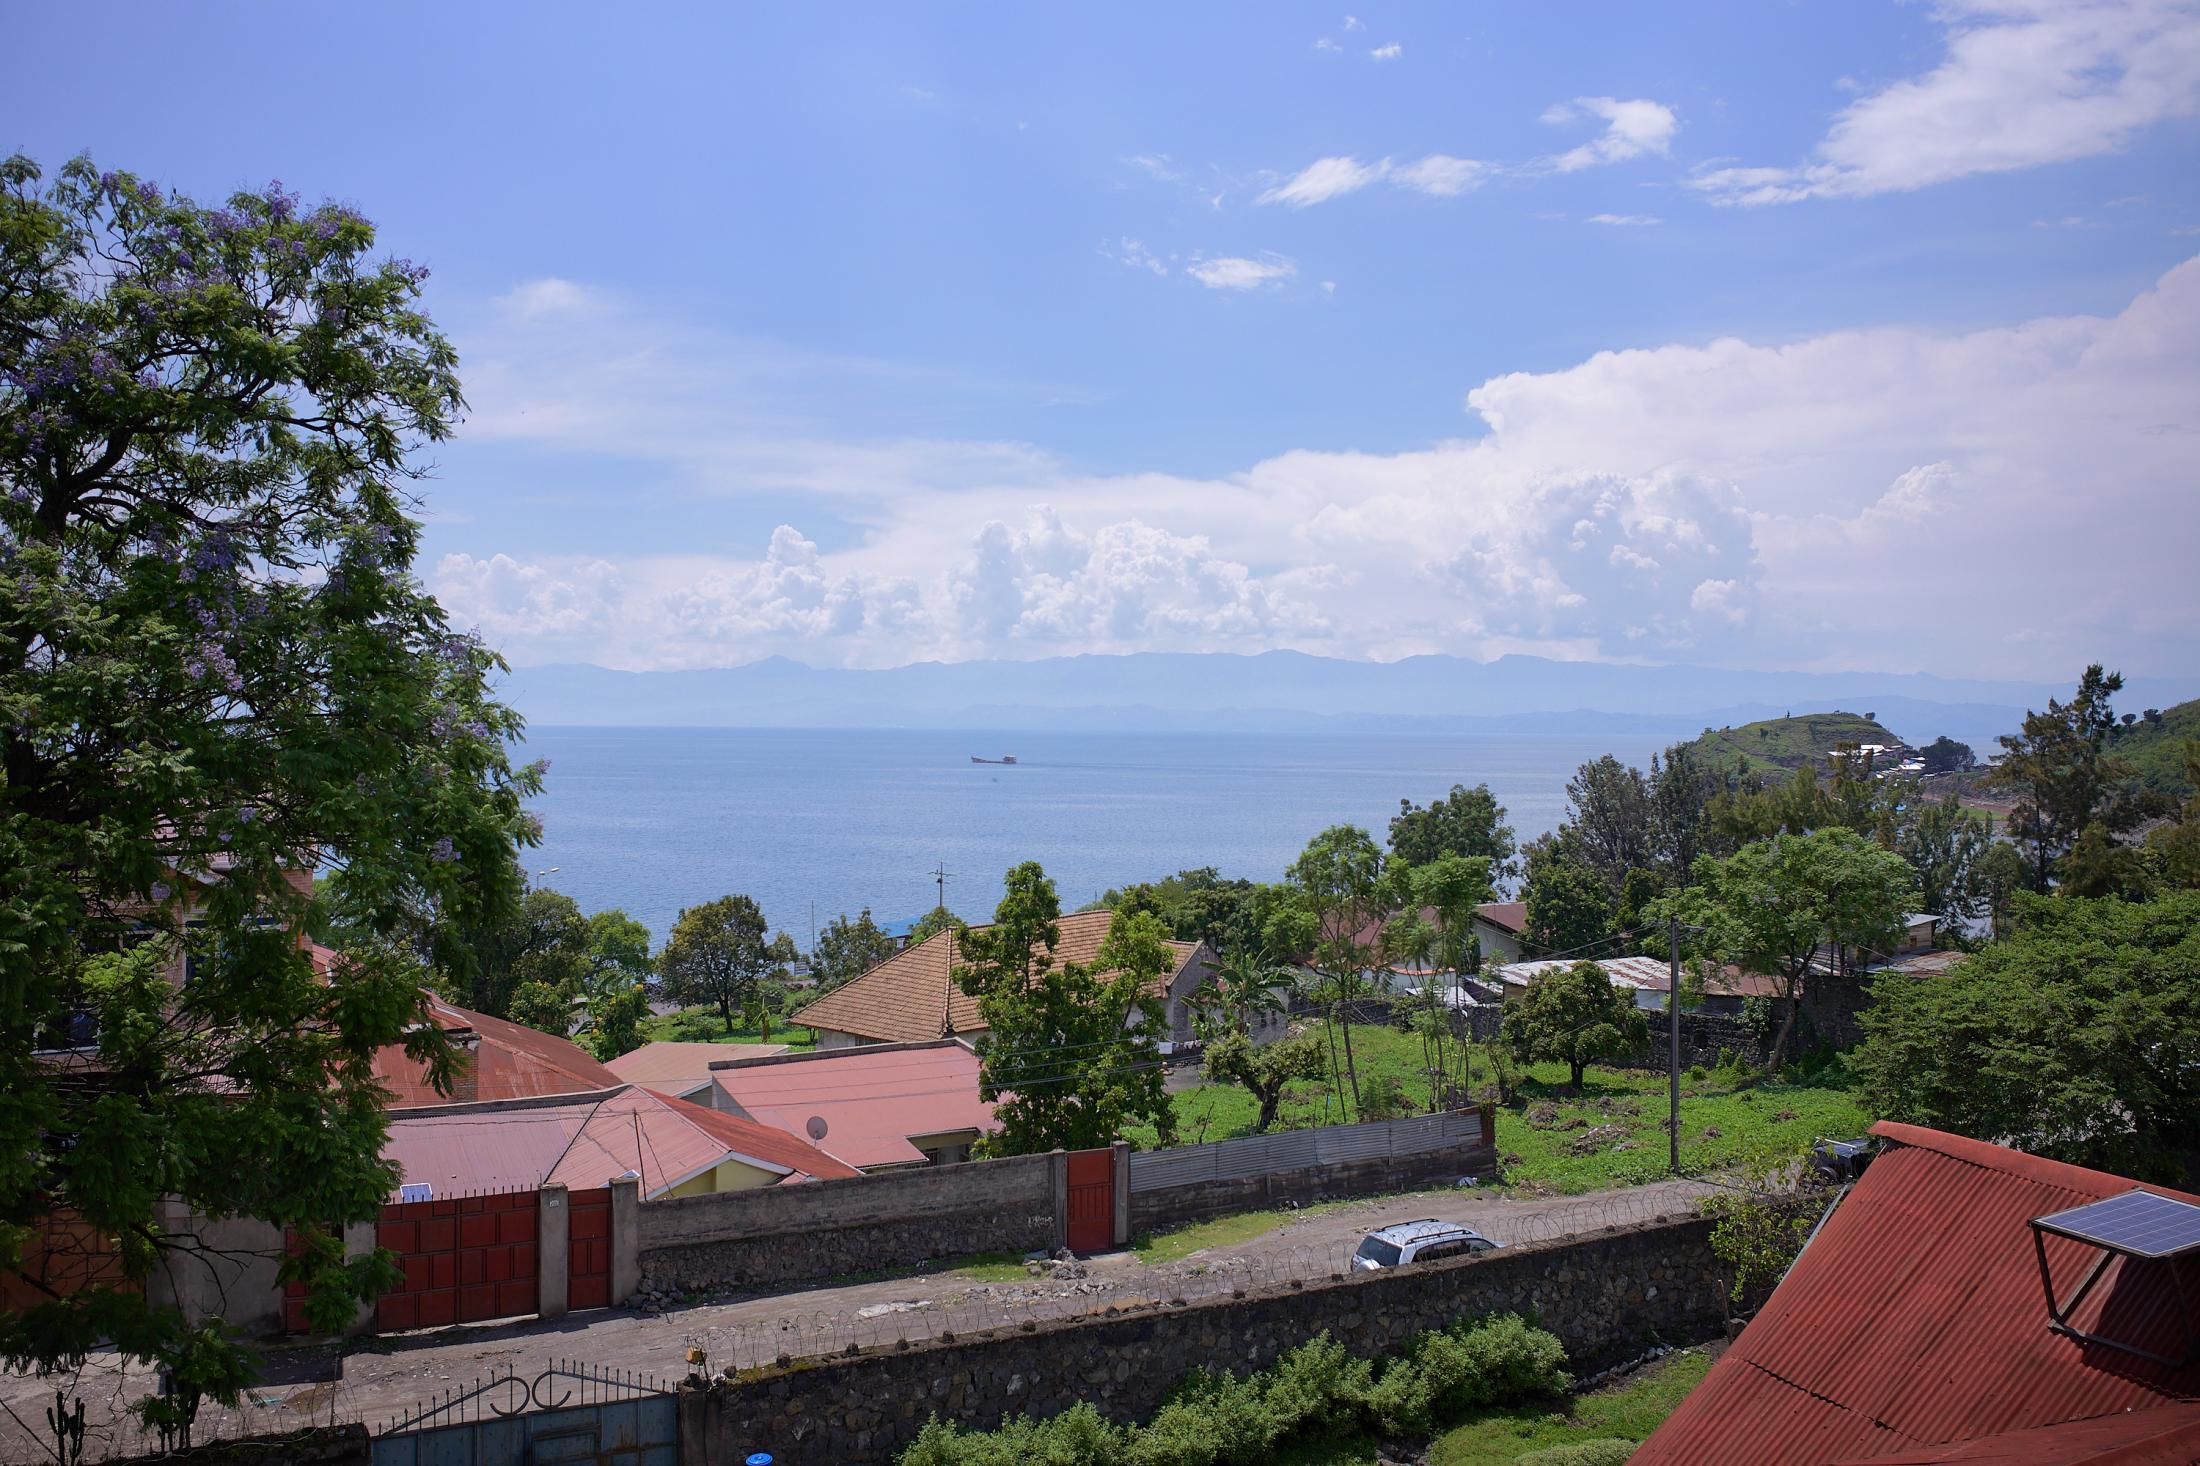 lake kivu – a view 1, goma, democratic republic of congo.